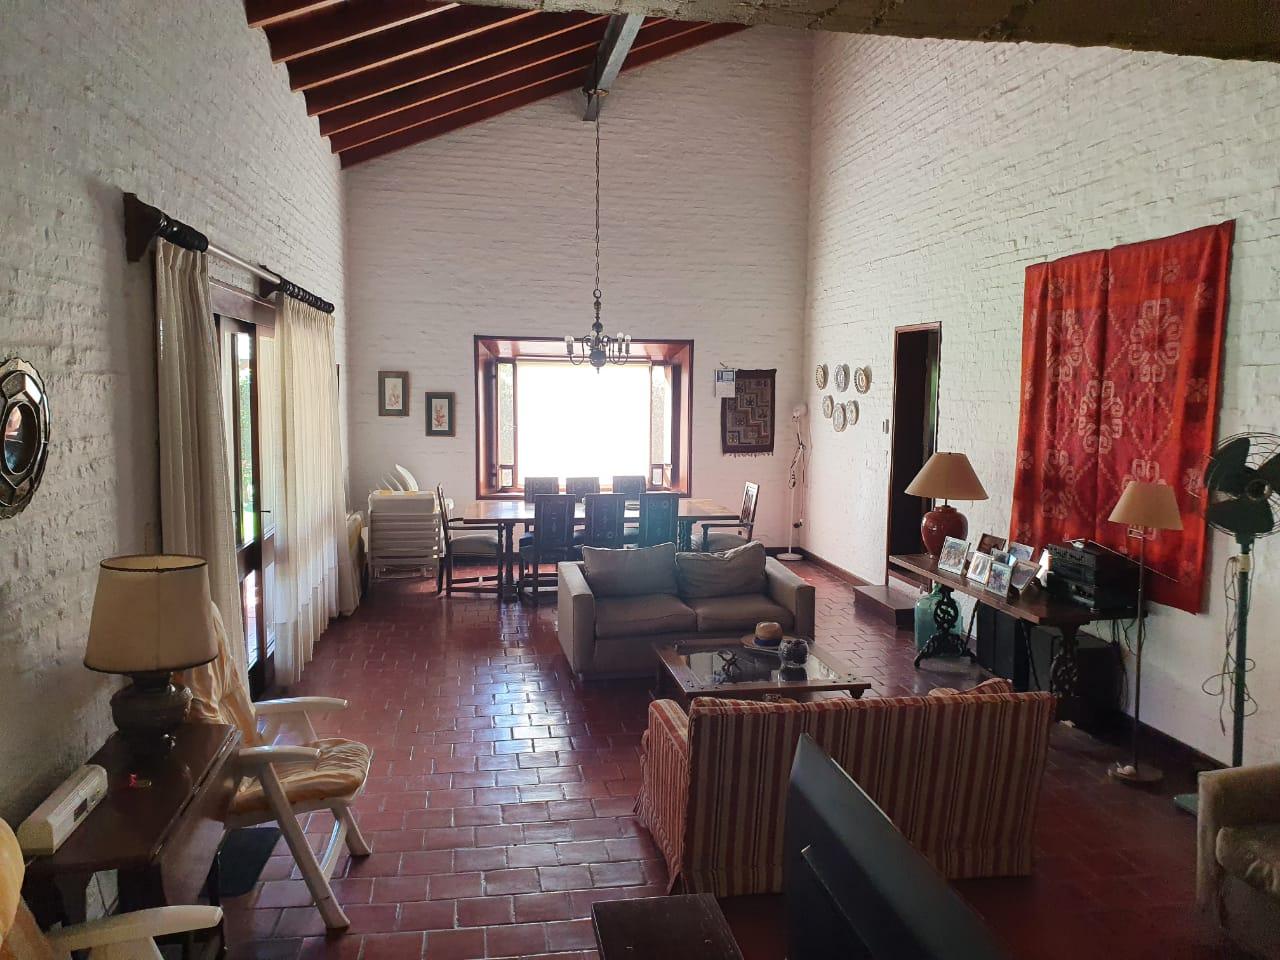 Tortugas Country Club REF 0069